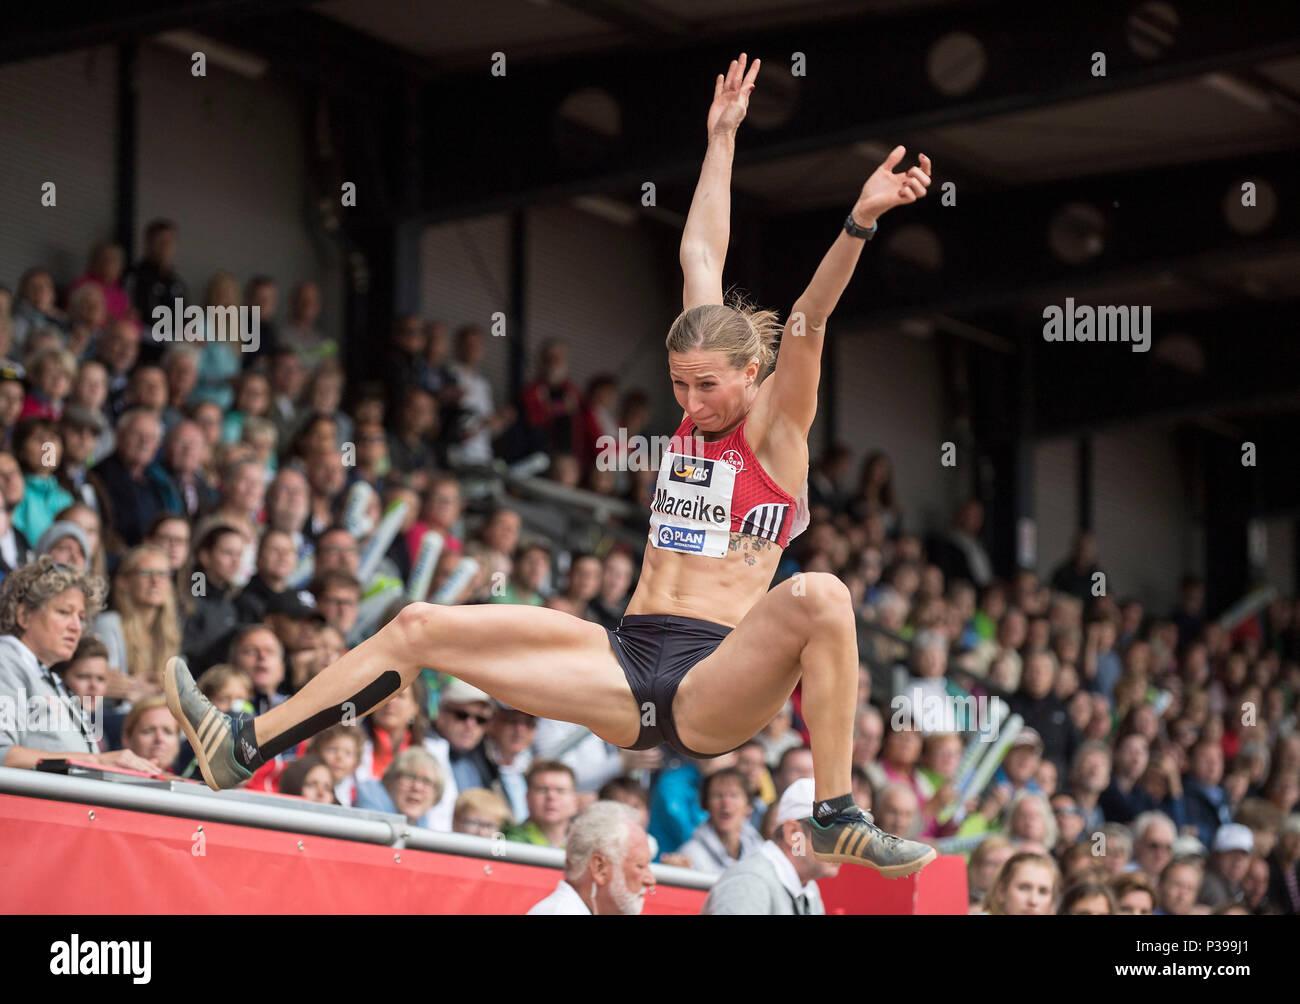 Mareike ARNDT (GER / TSV Bayer 04 Leverkusen), action, women's long jump, on 17.06.2018 Athletics Stadtwerke Ratingen Mehrkampf-Meeting, from 16.06. -17.06.2018 in Ratingen / Germany. | usage worldwide - Stock Image